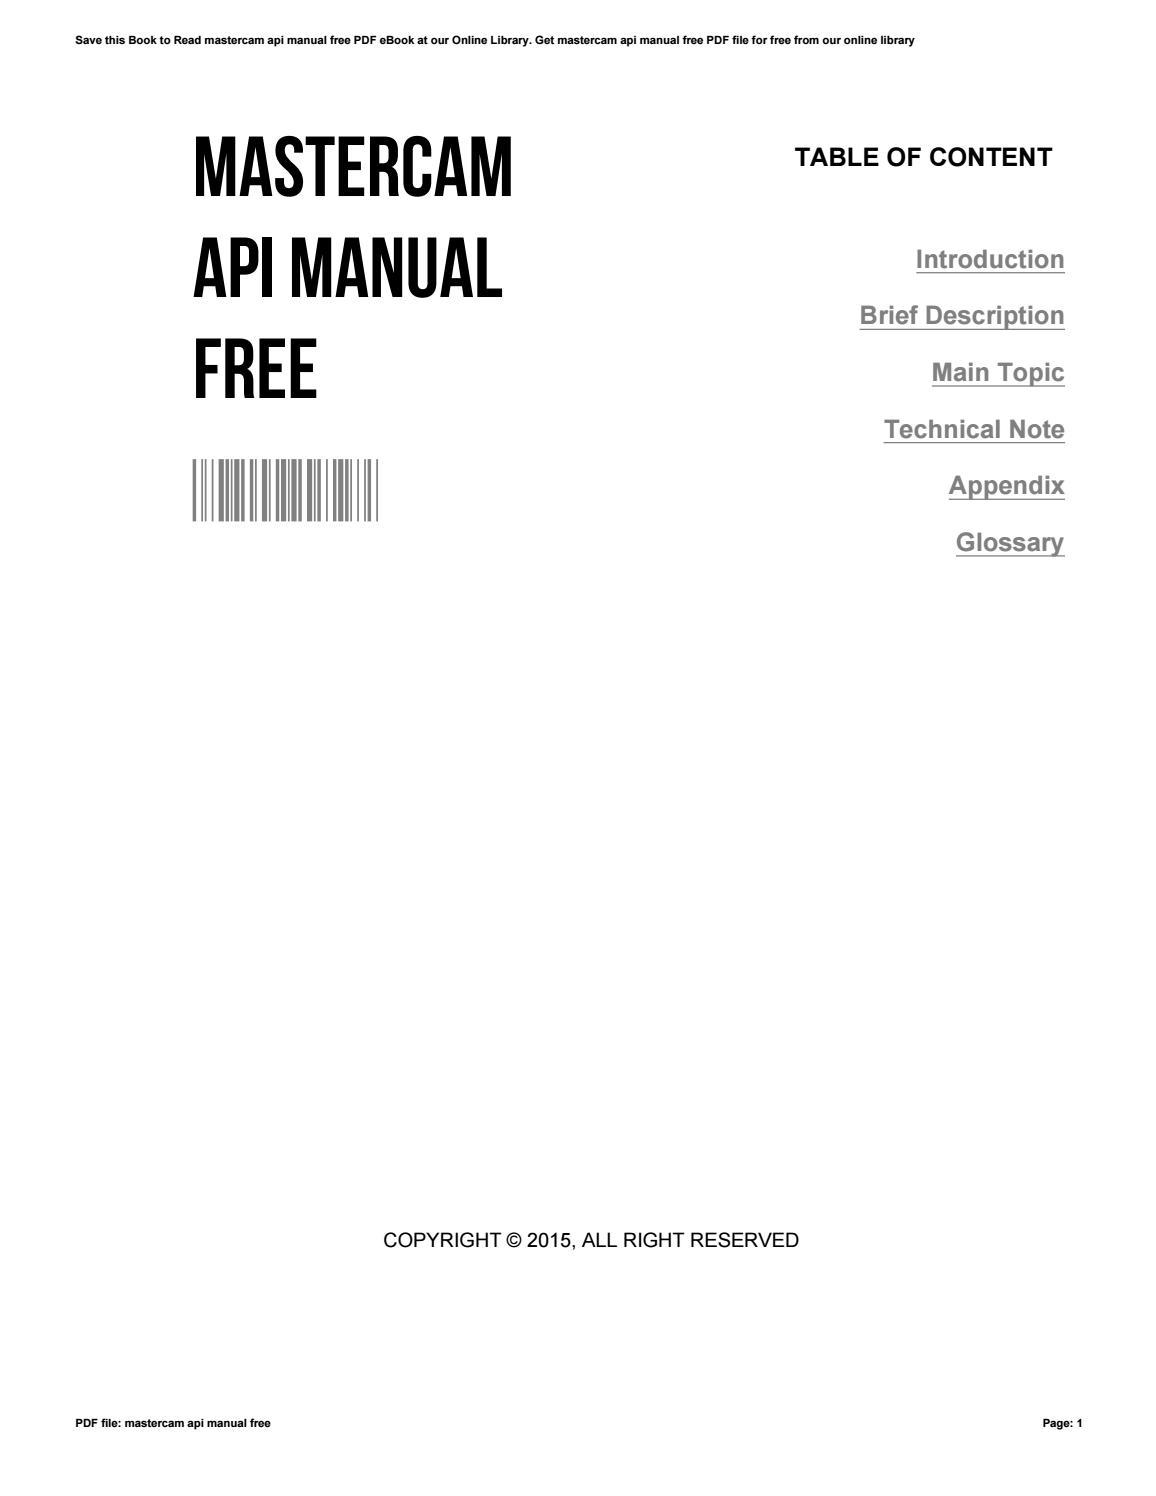 mastercam user manual browse manual guides u2022 rh megaentertainment us mastercam x9 user manual Siemens NX